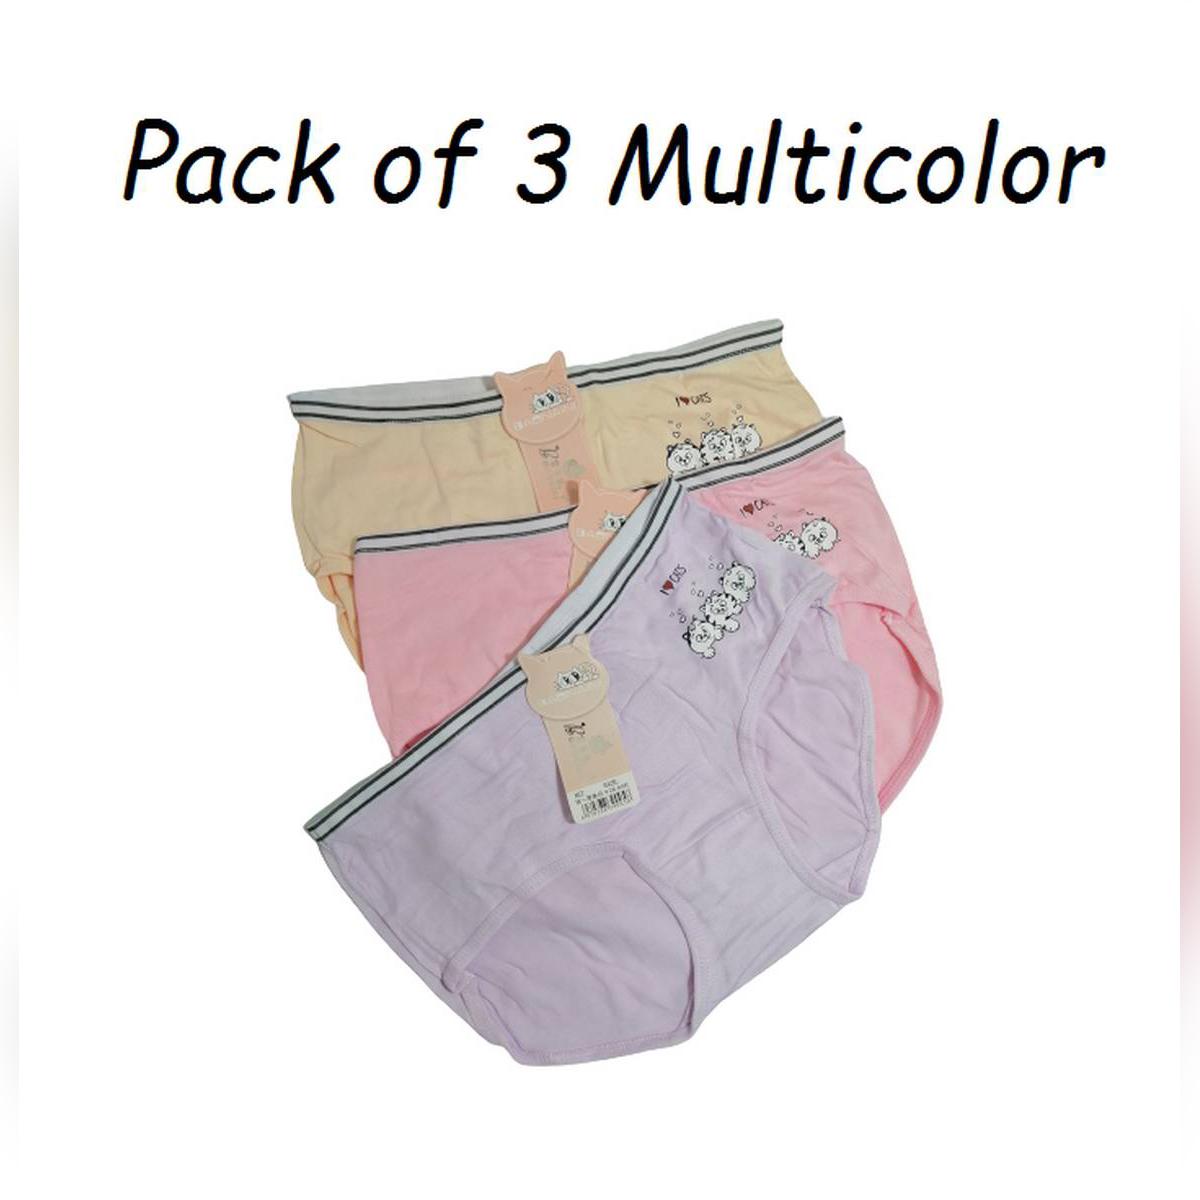 Pack Of 3 Girl Briefs Women'S Panties Cotton Cat Print Underwear Female Casual Cartoon Underpants Ladies Lingerie Teenager Panty Multicolor